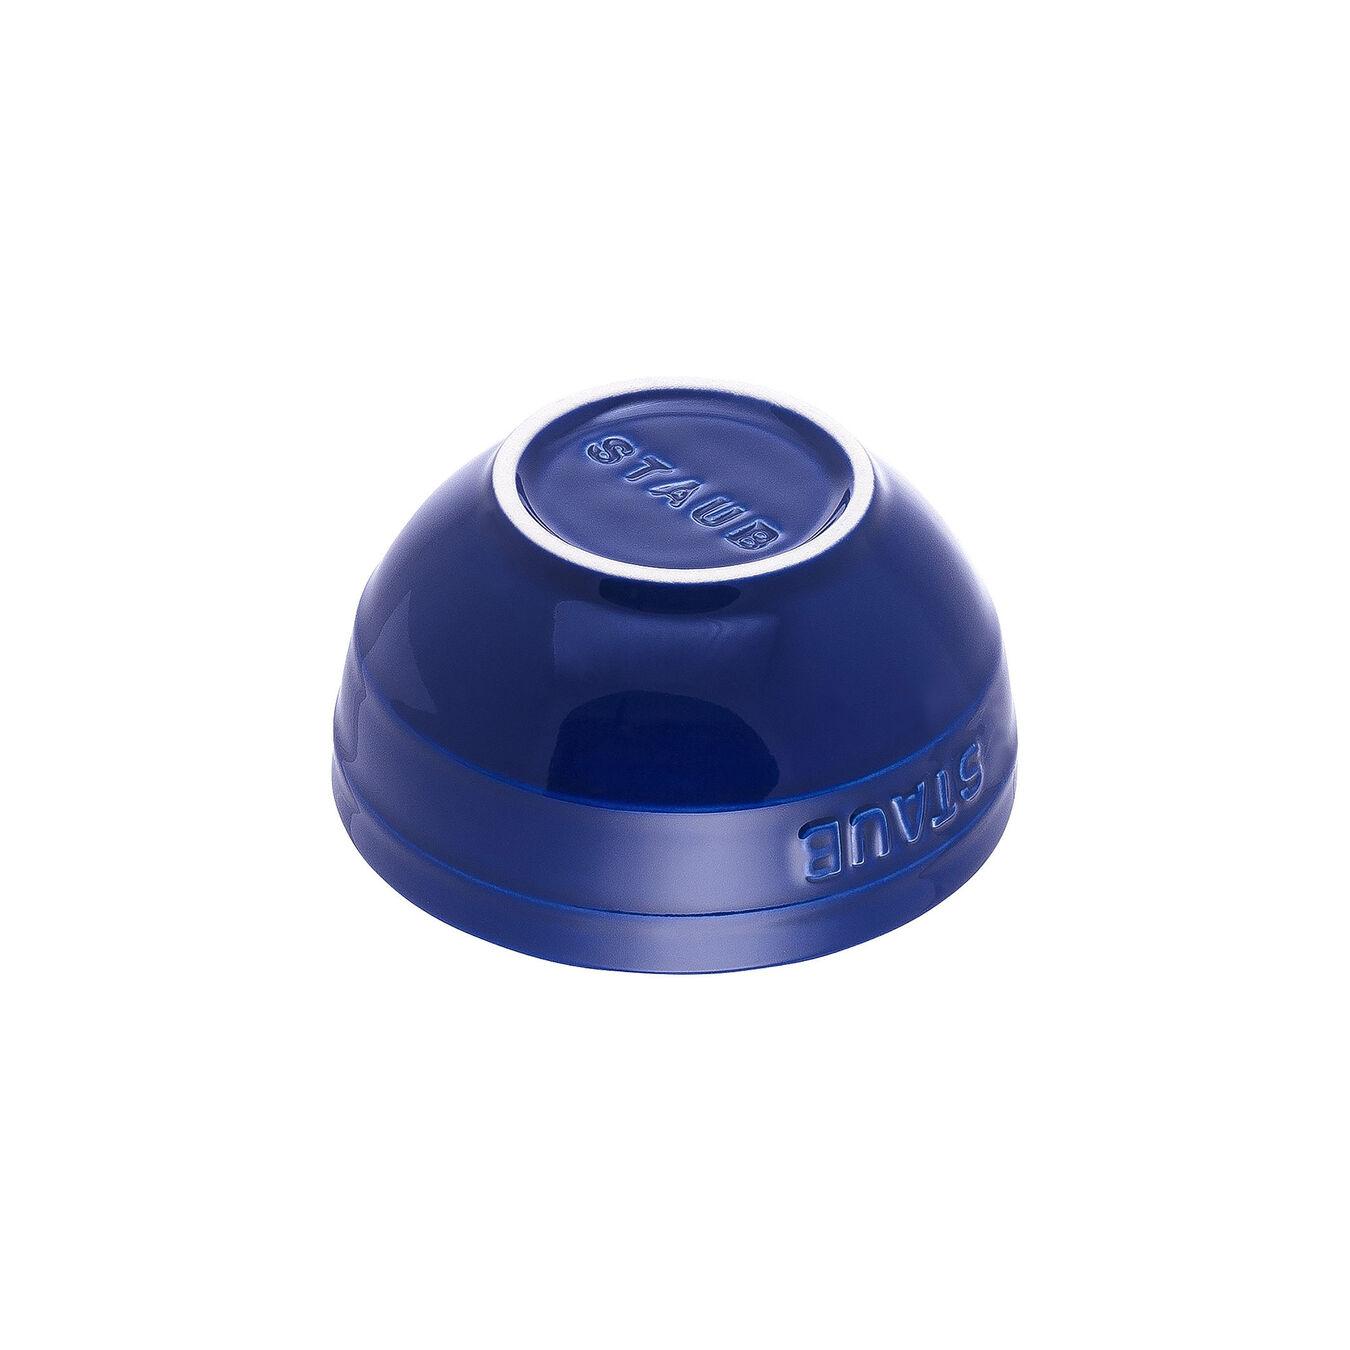 6.5-inch, Large Universal Bowl, dark blue,,large 2